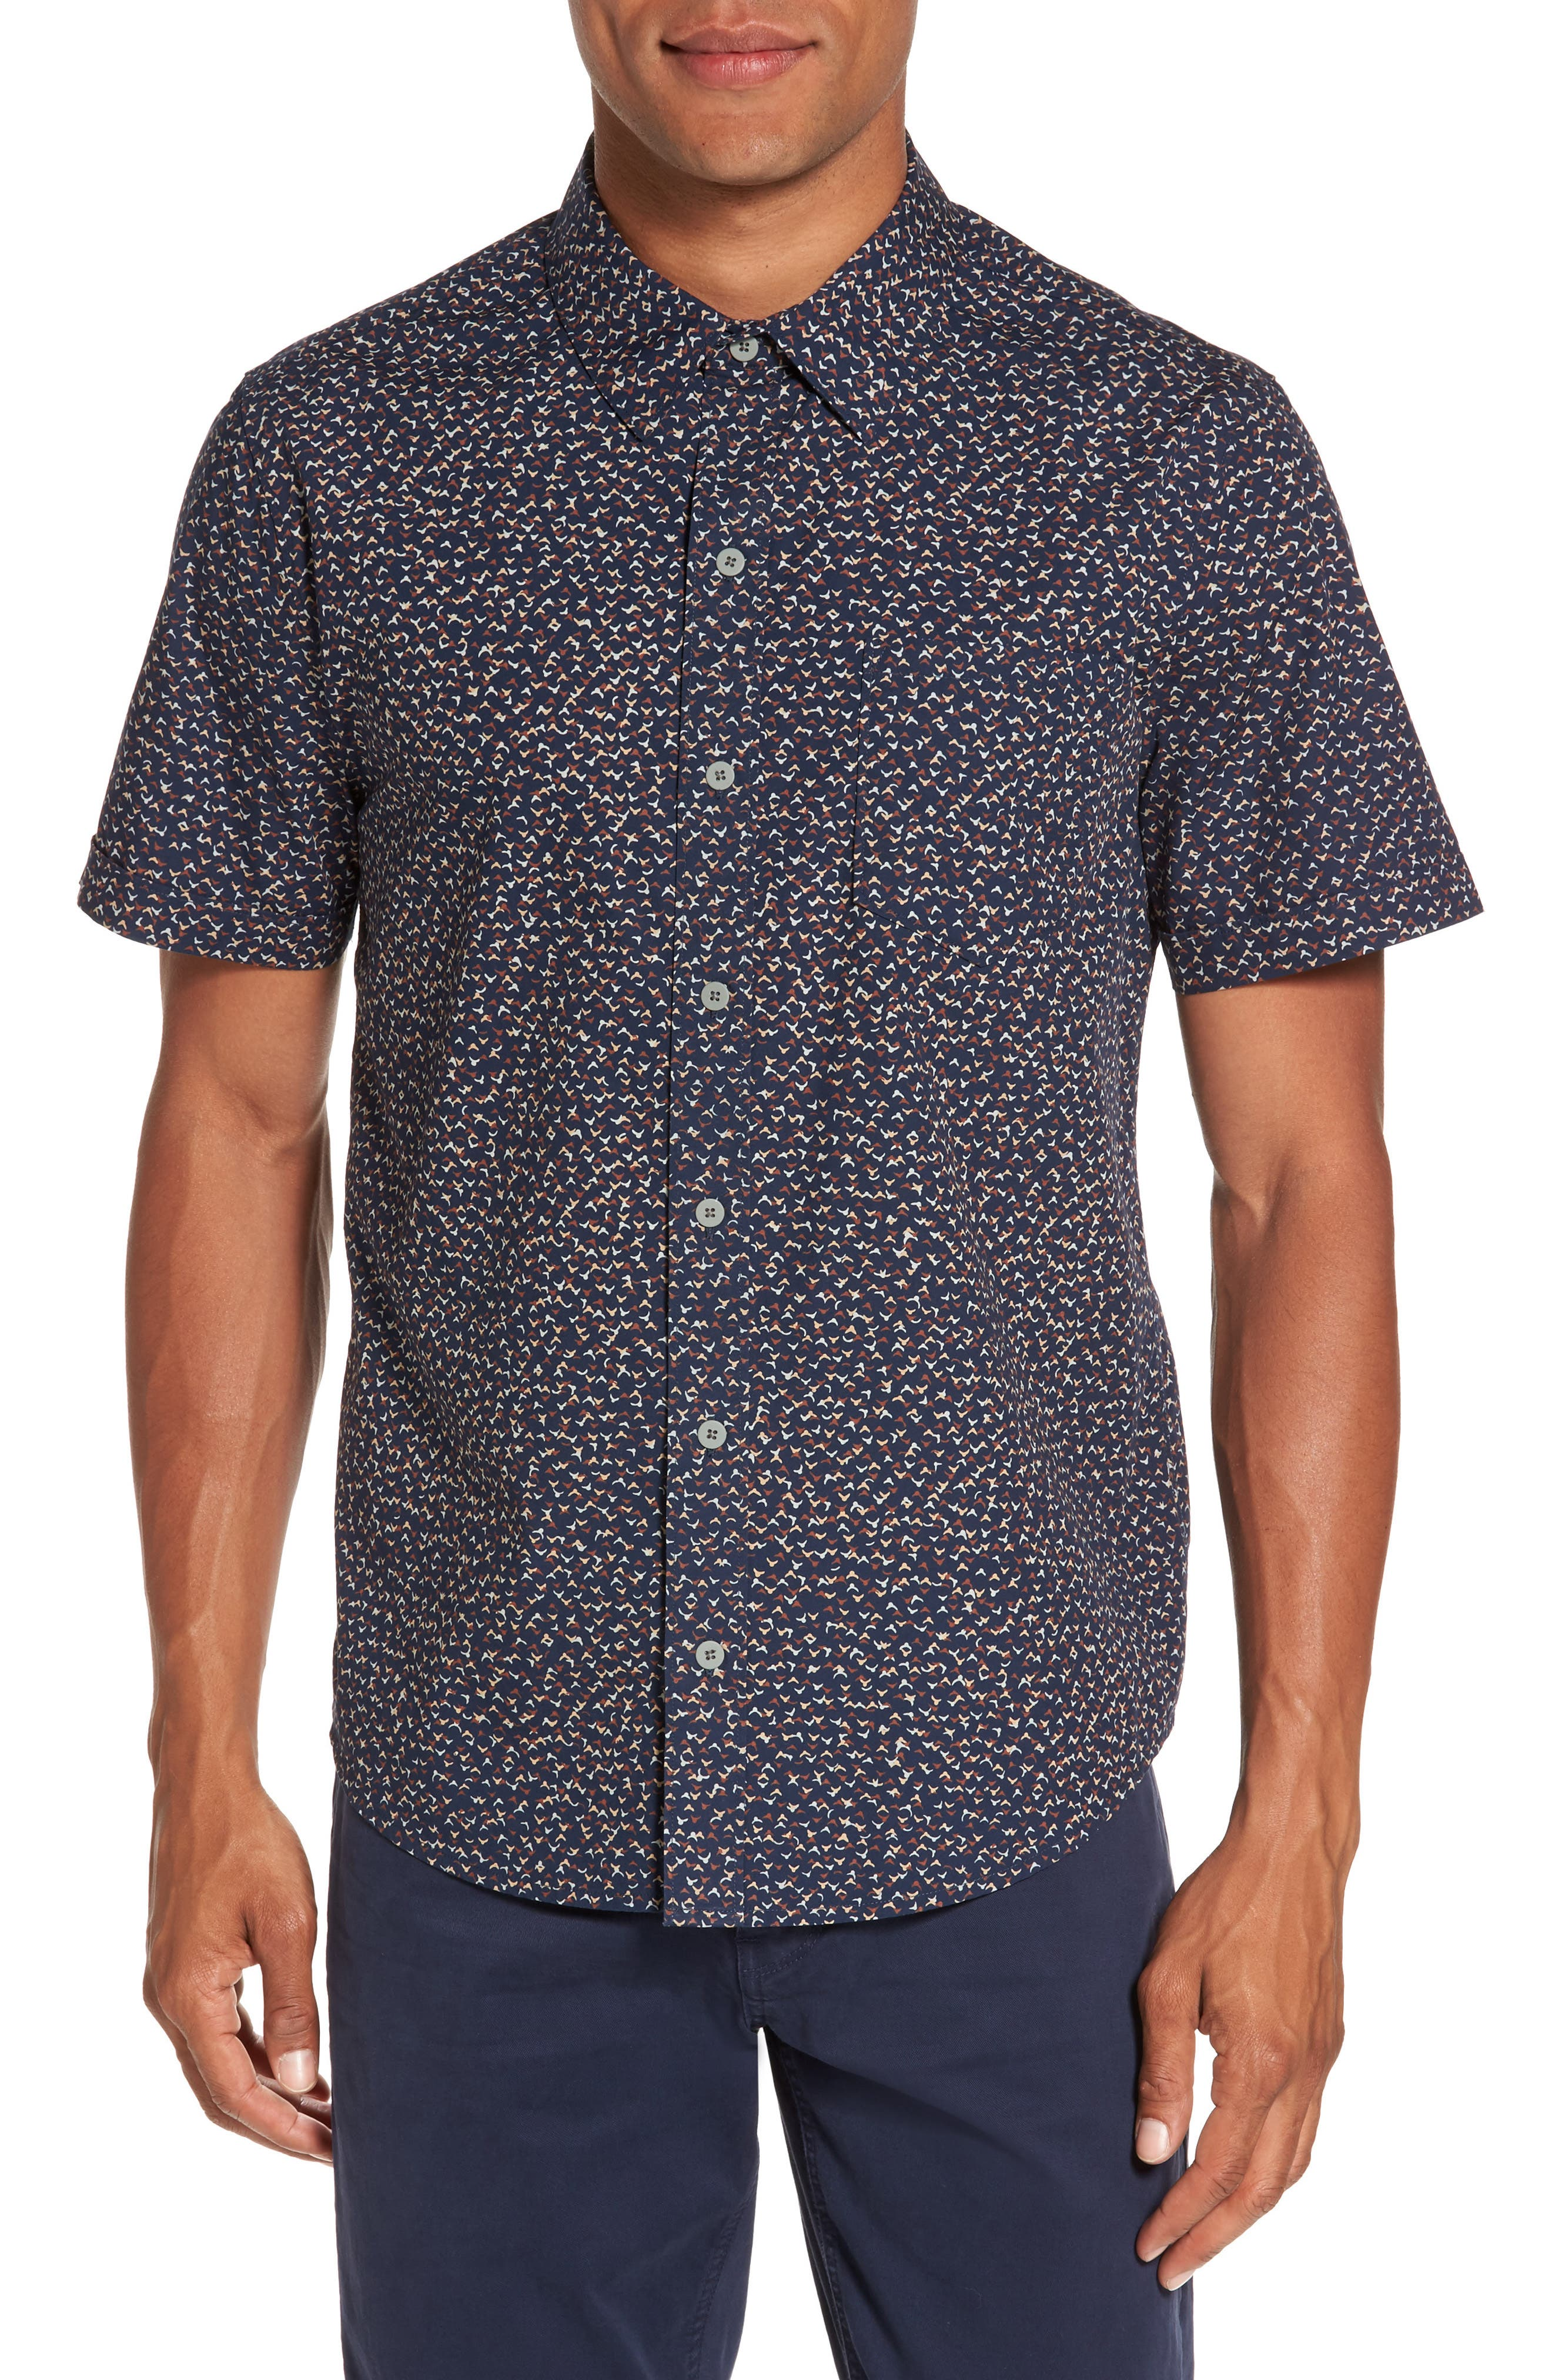 Main Image - PAIGE Becker Patterned Woven Shirt